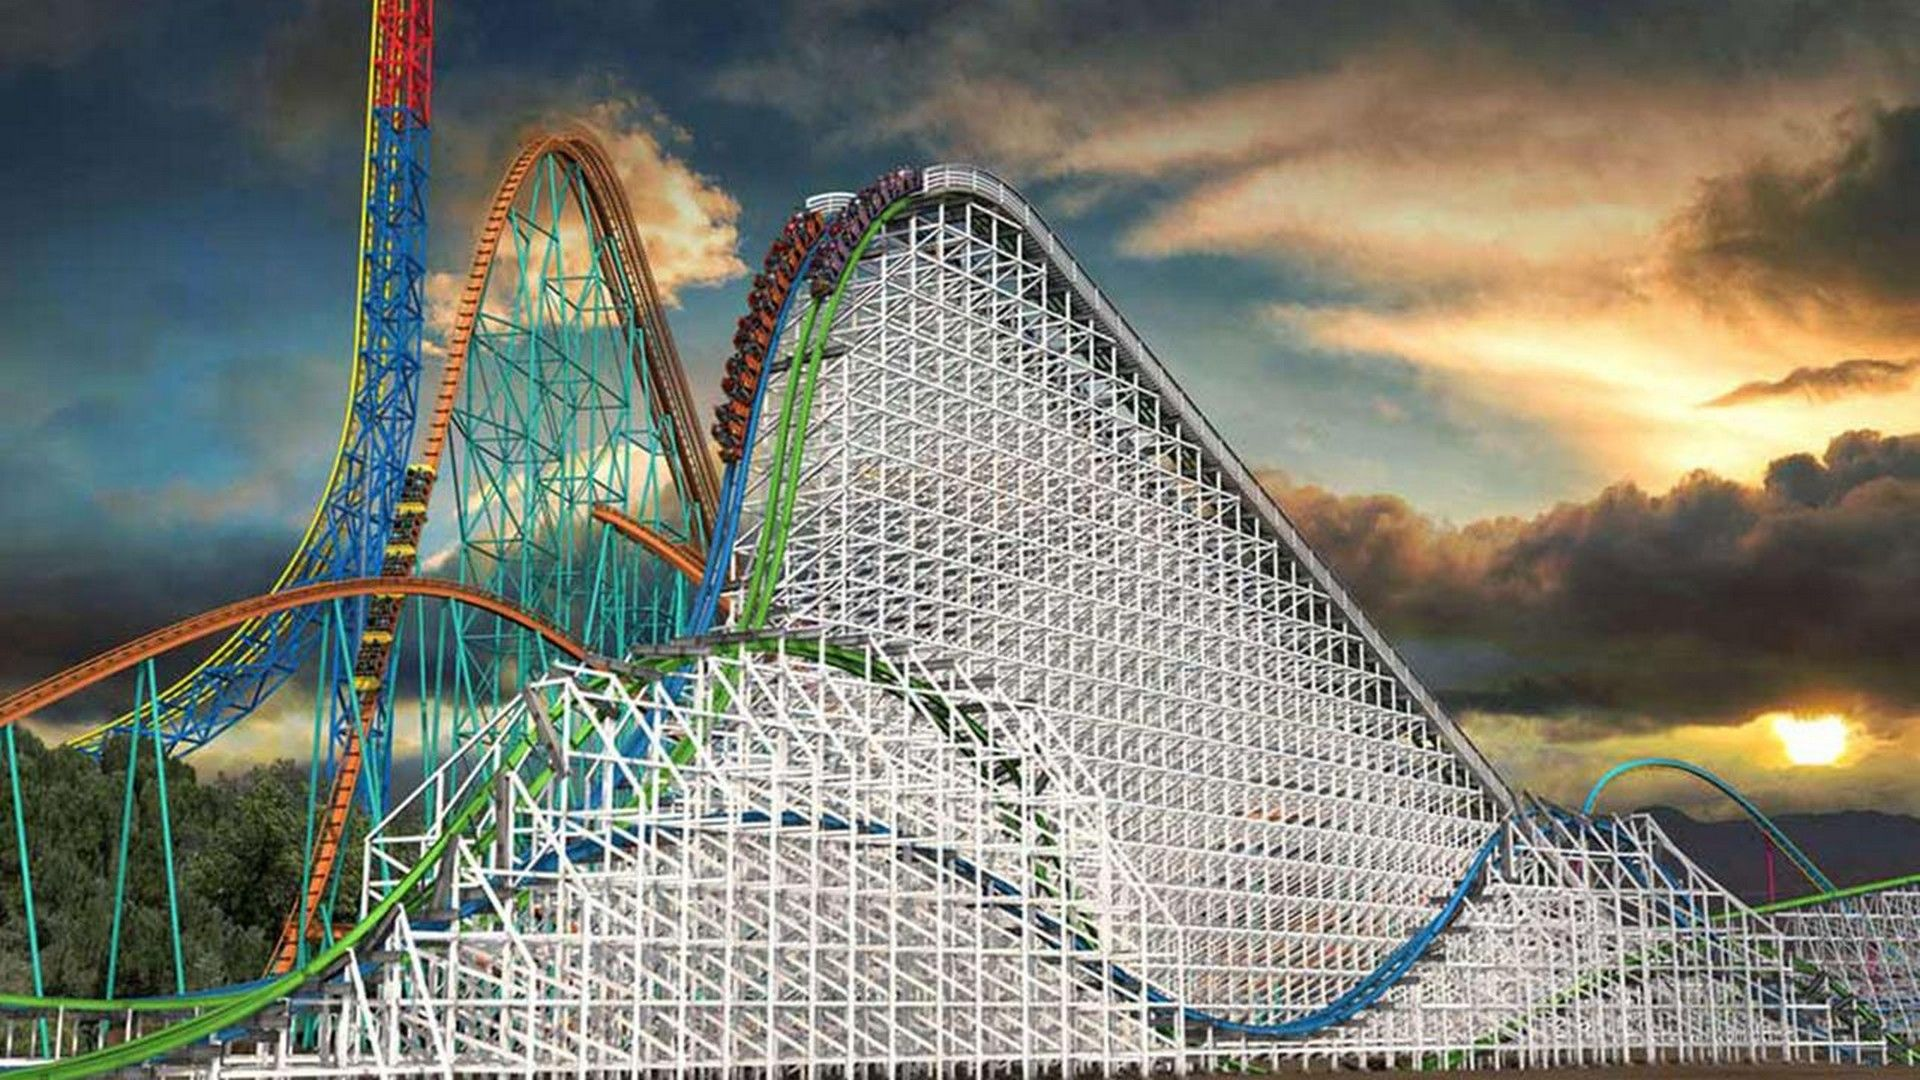 HD Six Flags Magic Mountain wallpaper Faves At Six Flags Magic 1920x1080